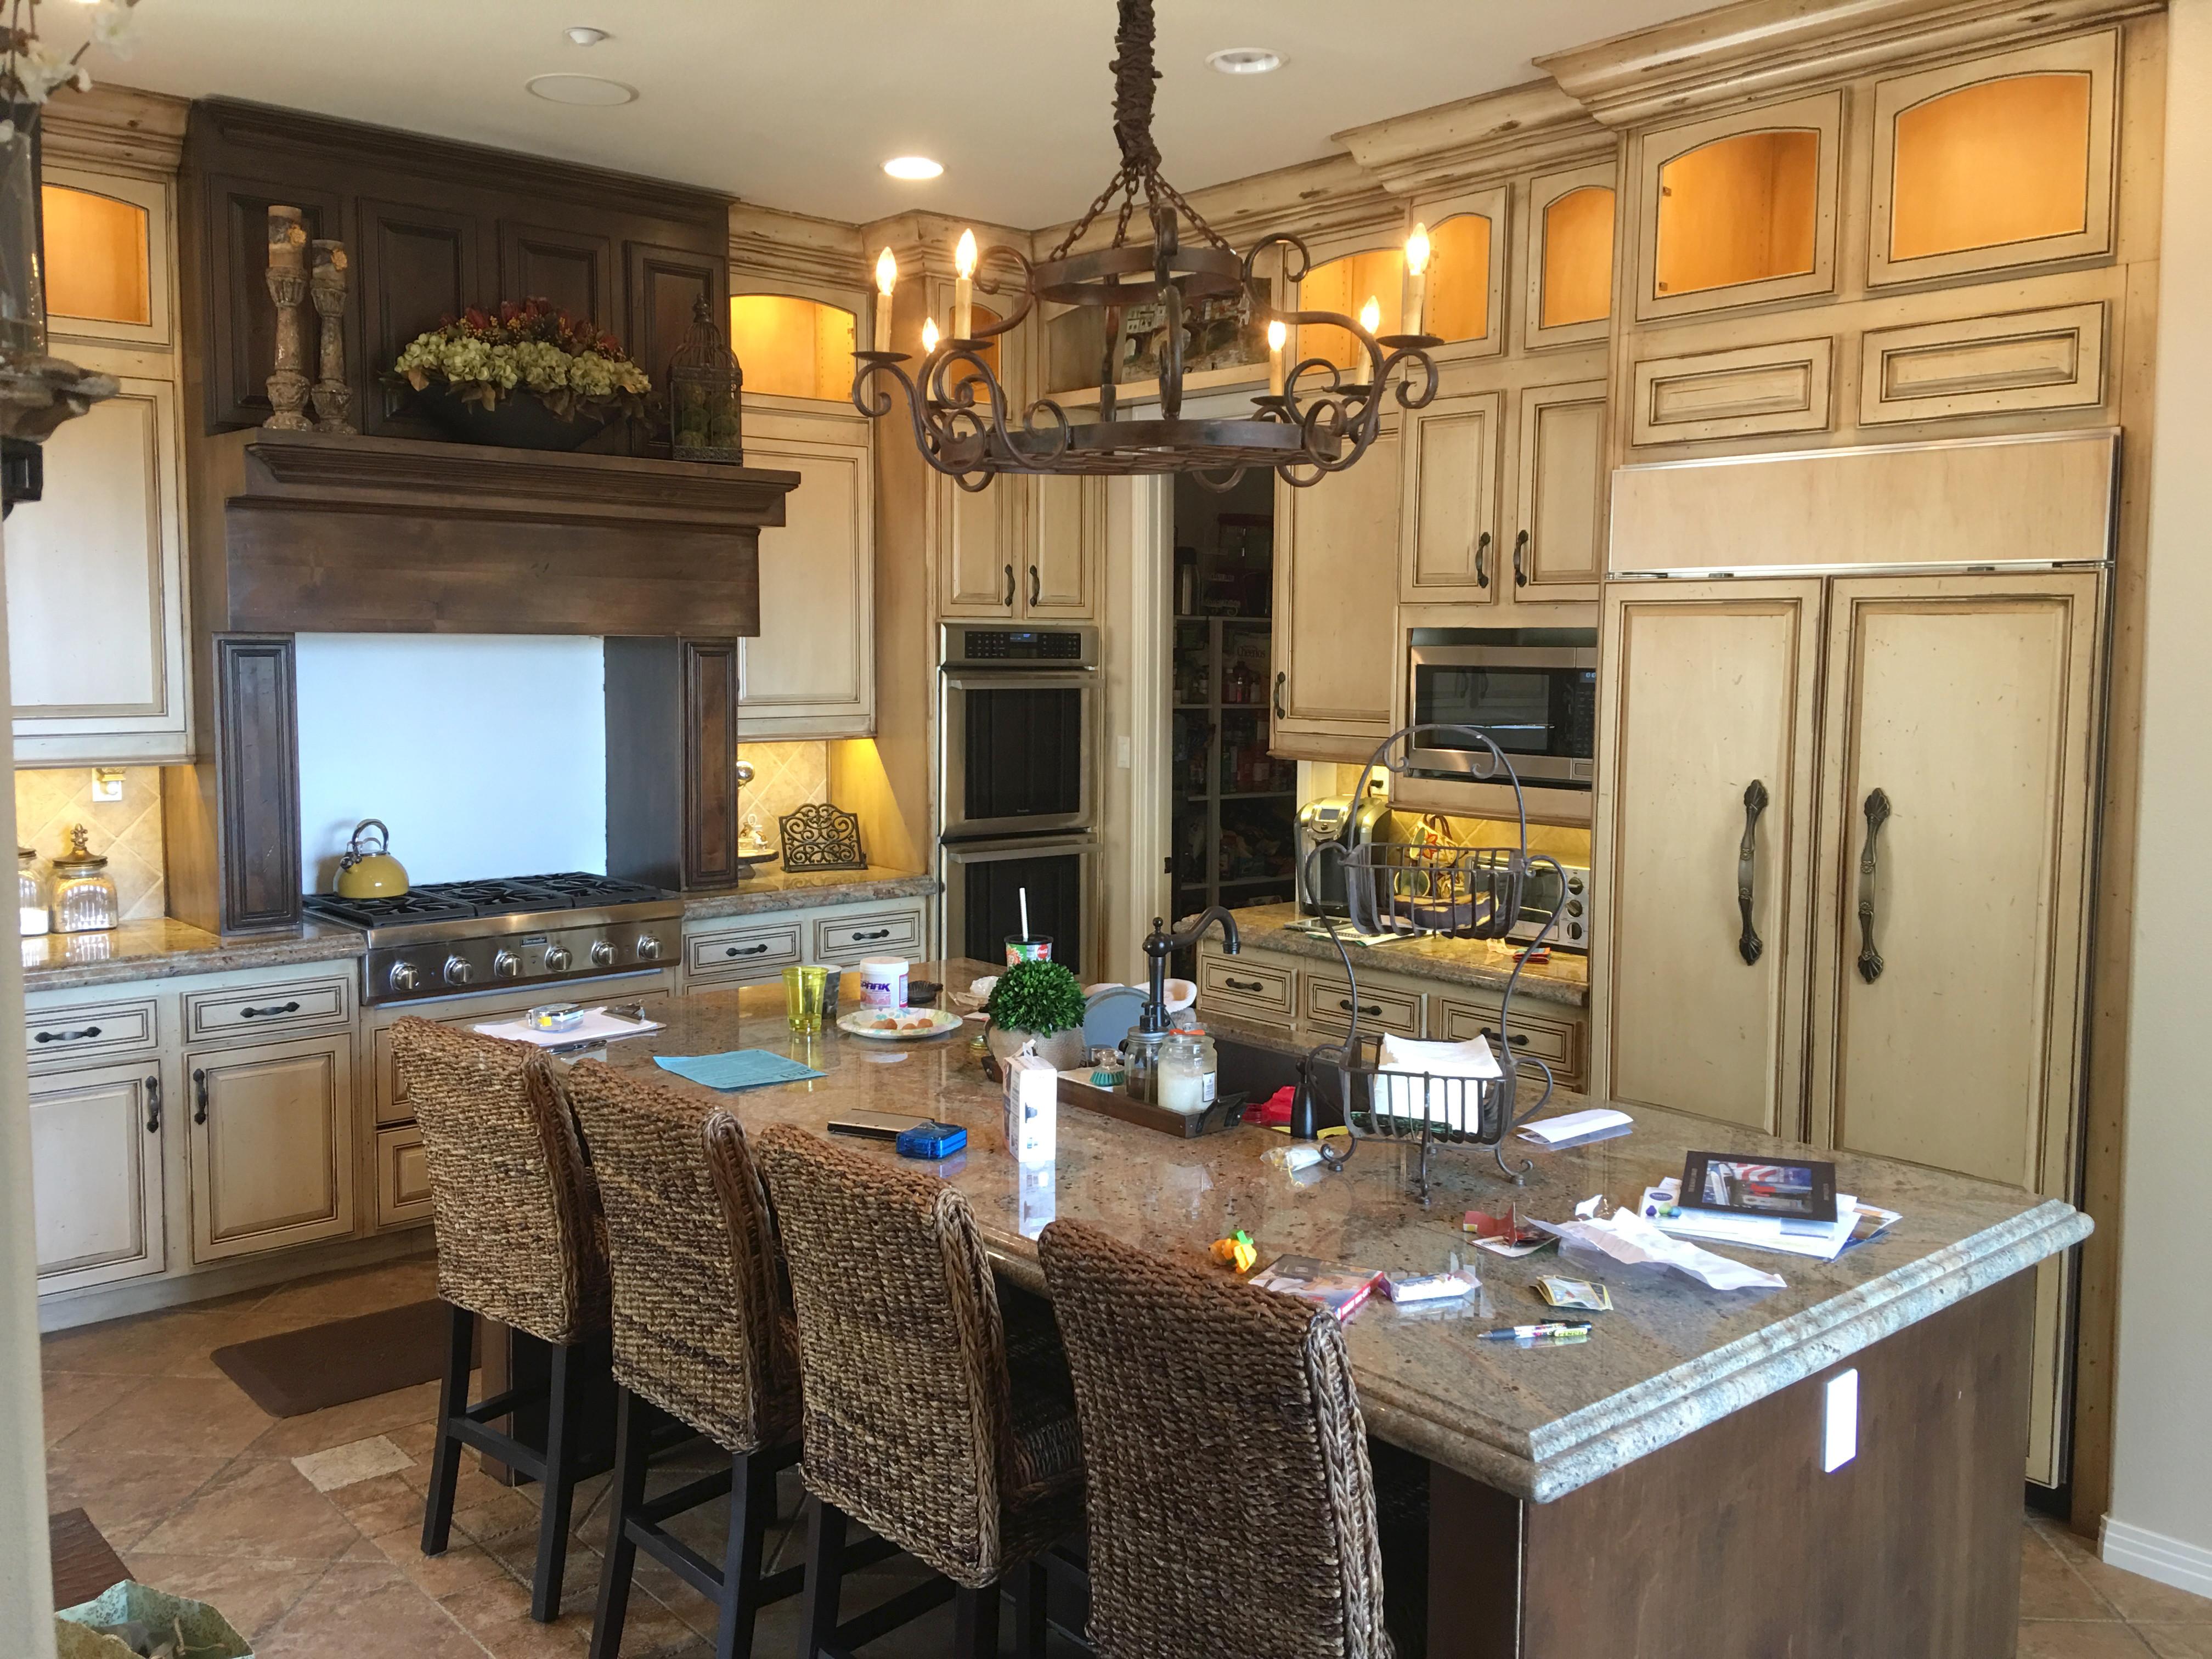 Kitchen Cabinet Refinishing Refacing Remodeling San